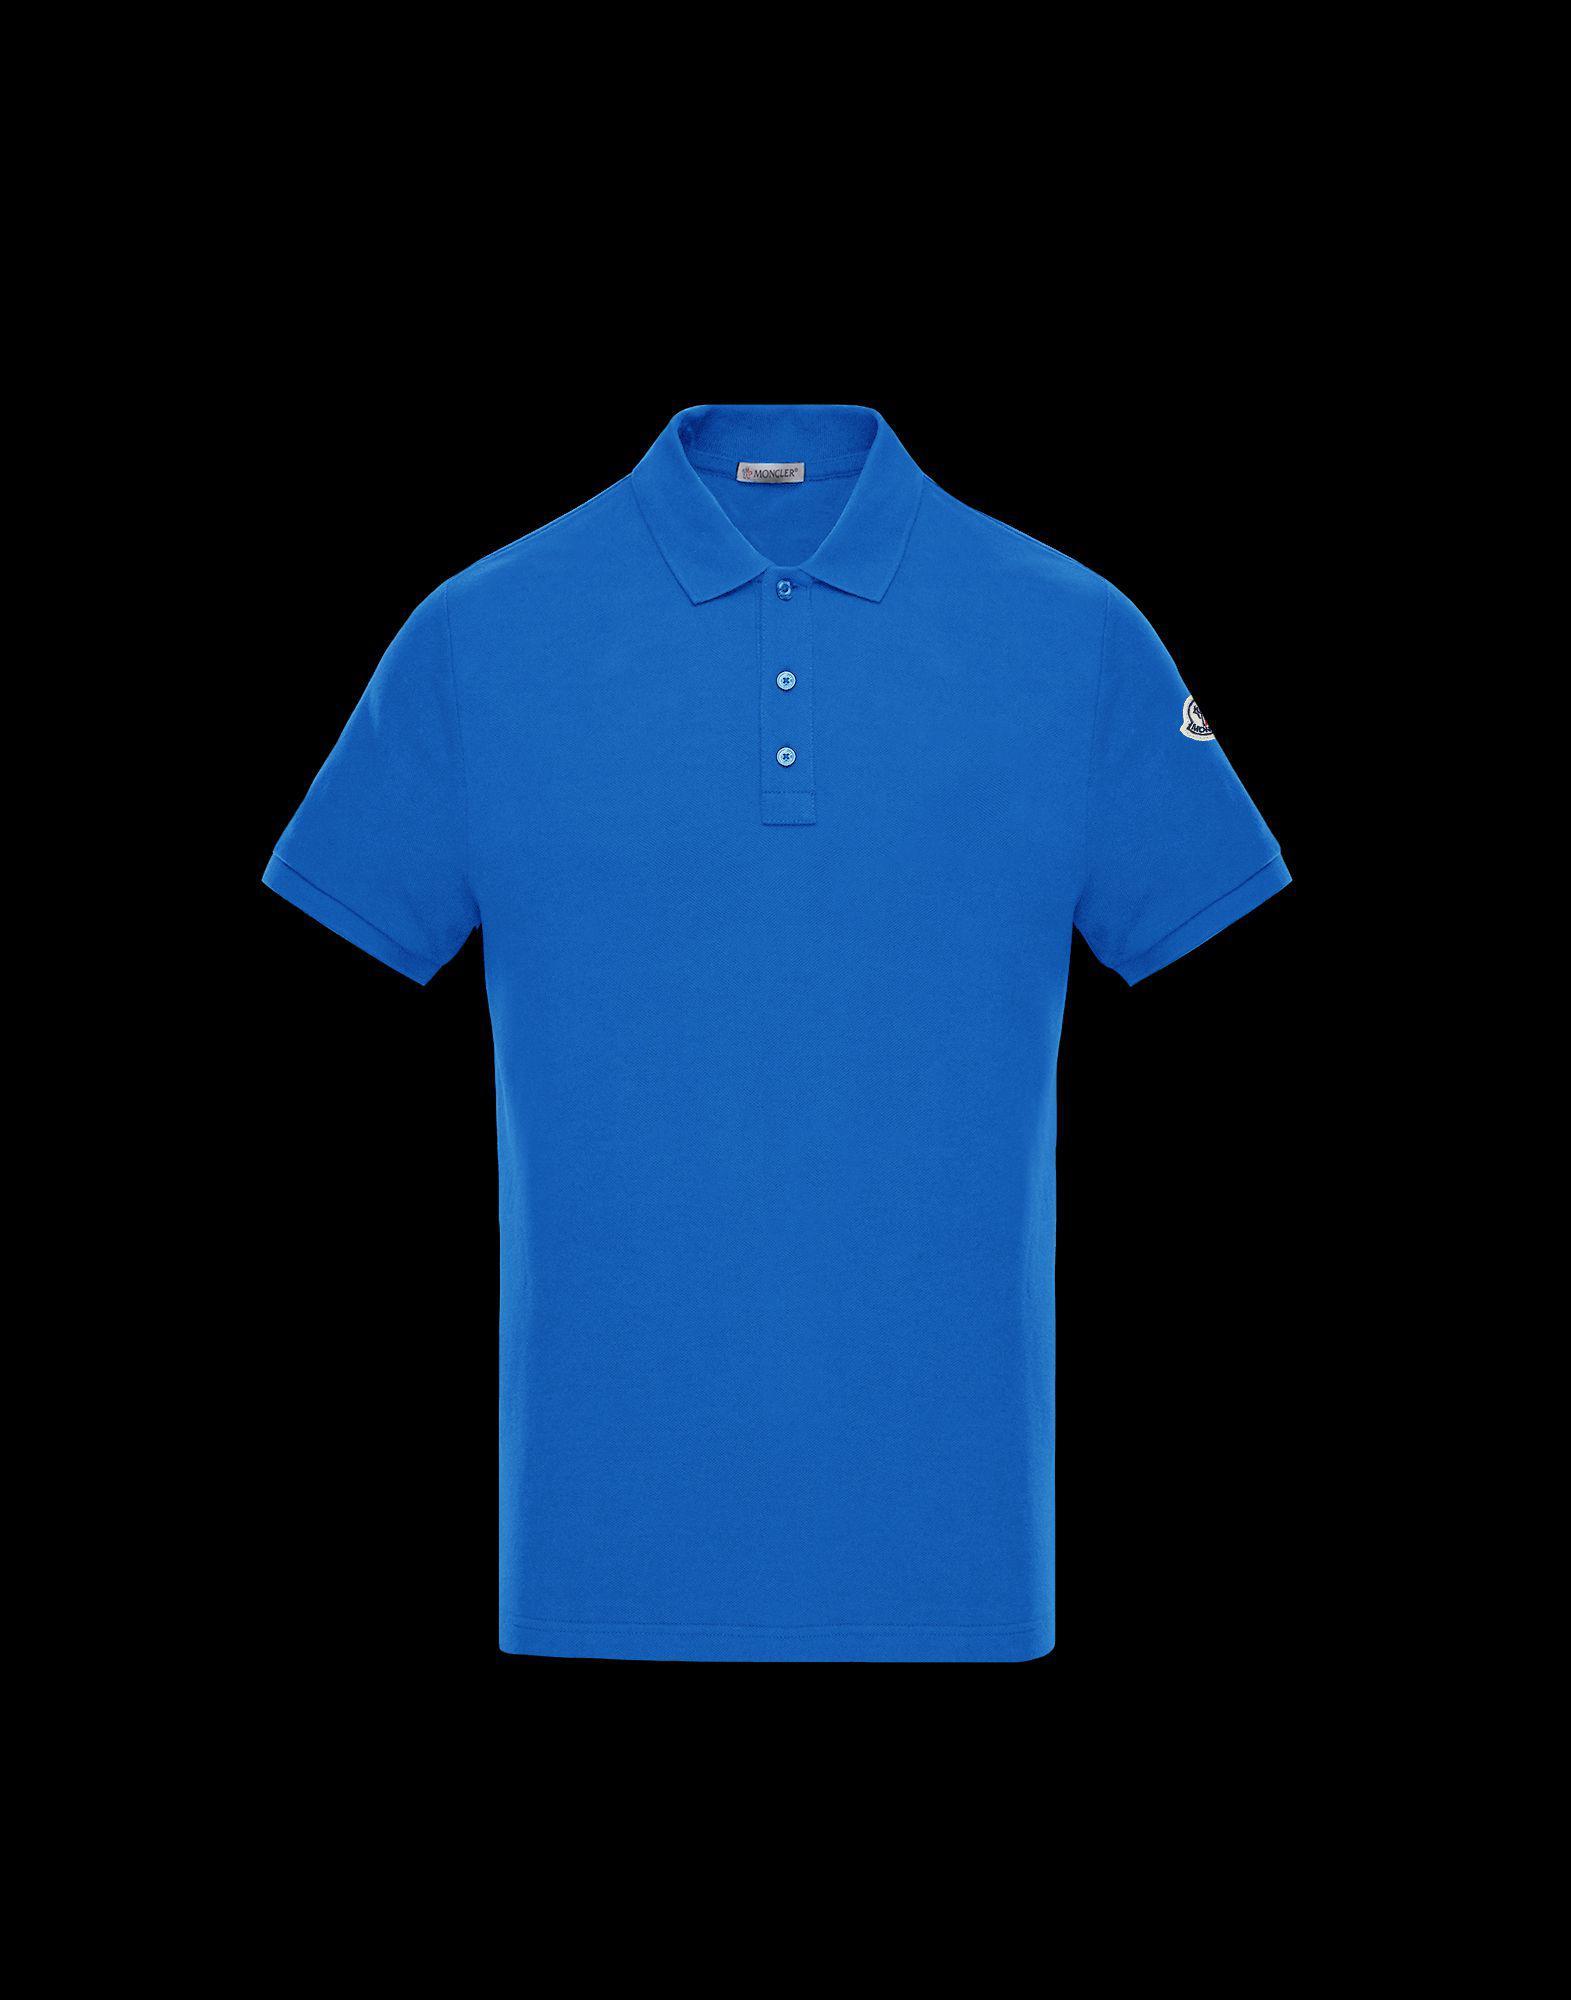 ba38a5ce301d Lyst - Moncler Polo Shirt in Blue for Men